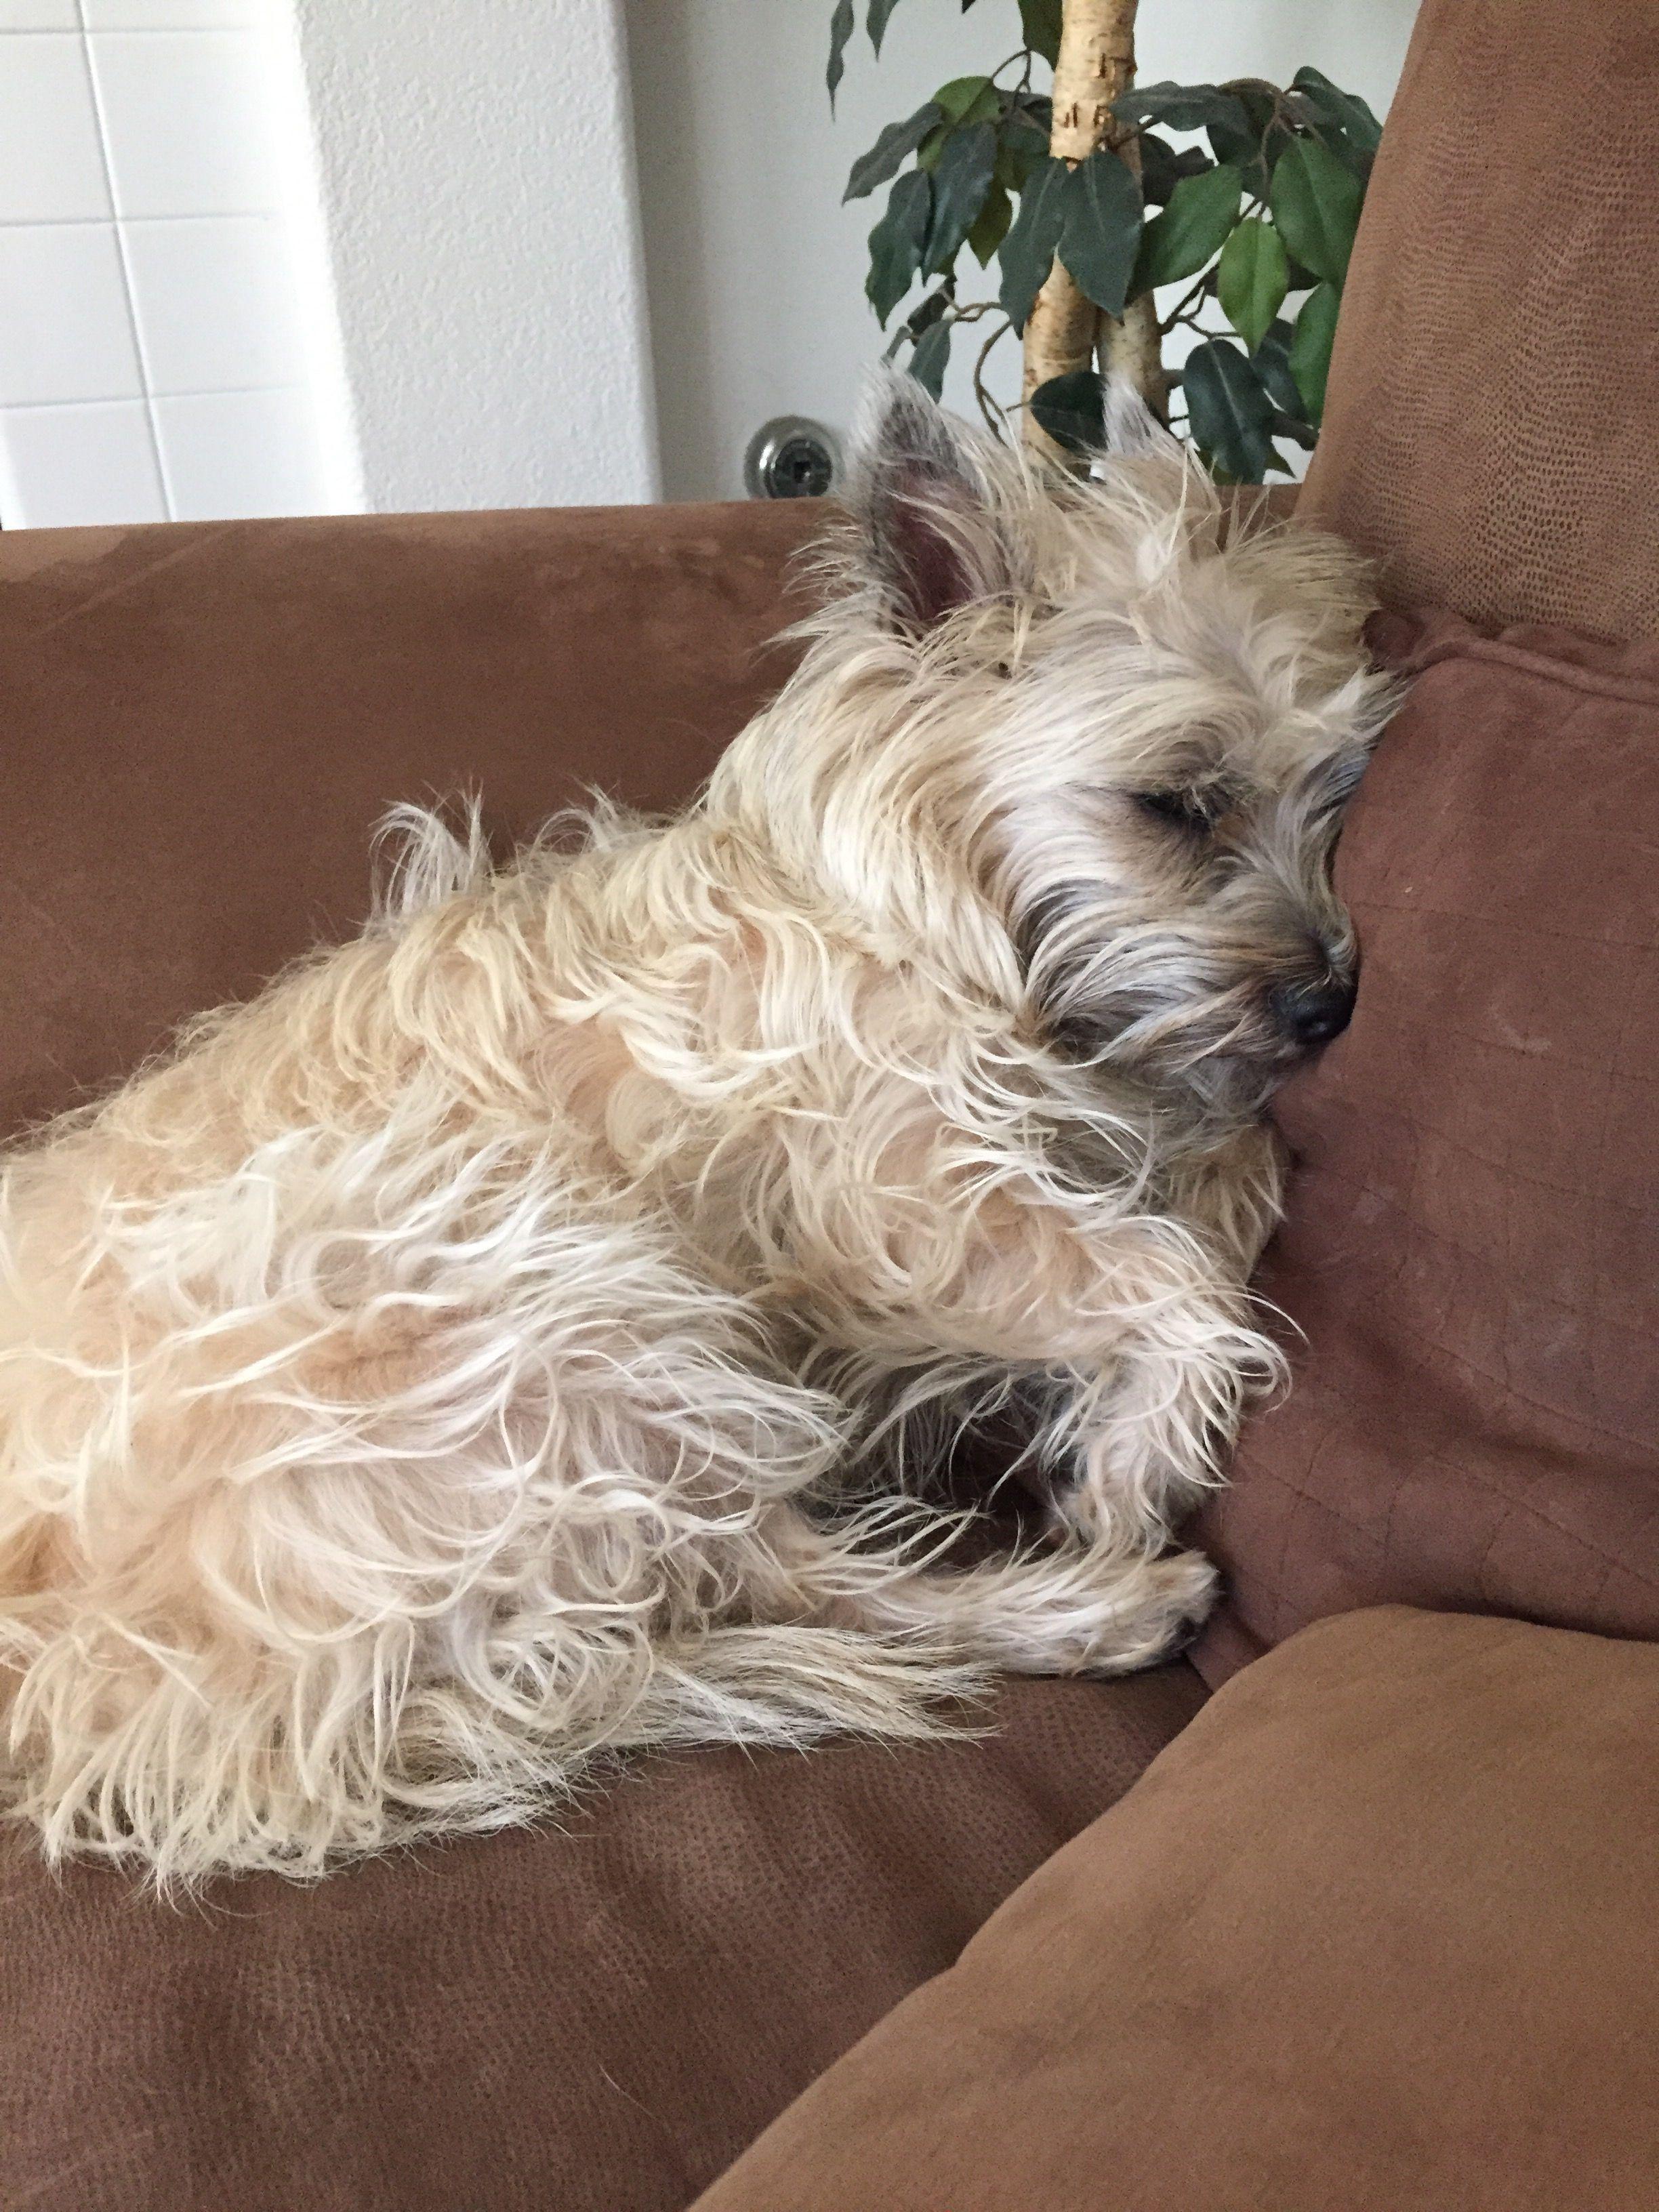 Pin By Kelli Ruiz On Cute Things Cairn Terrier Dogs Cute Dogs